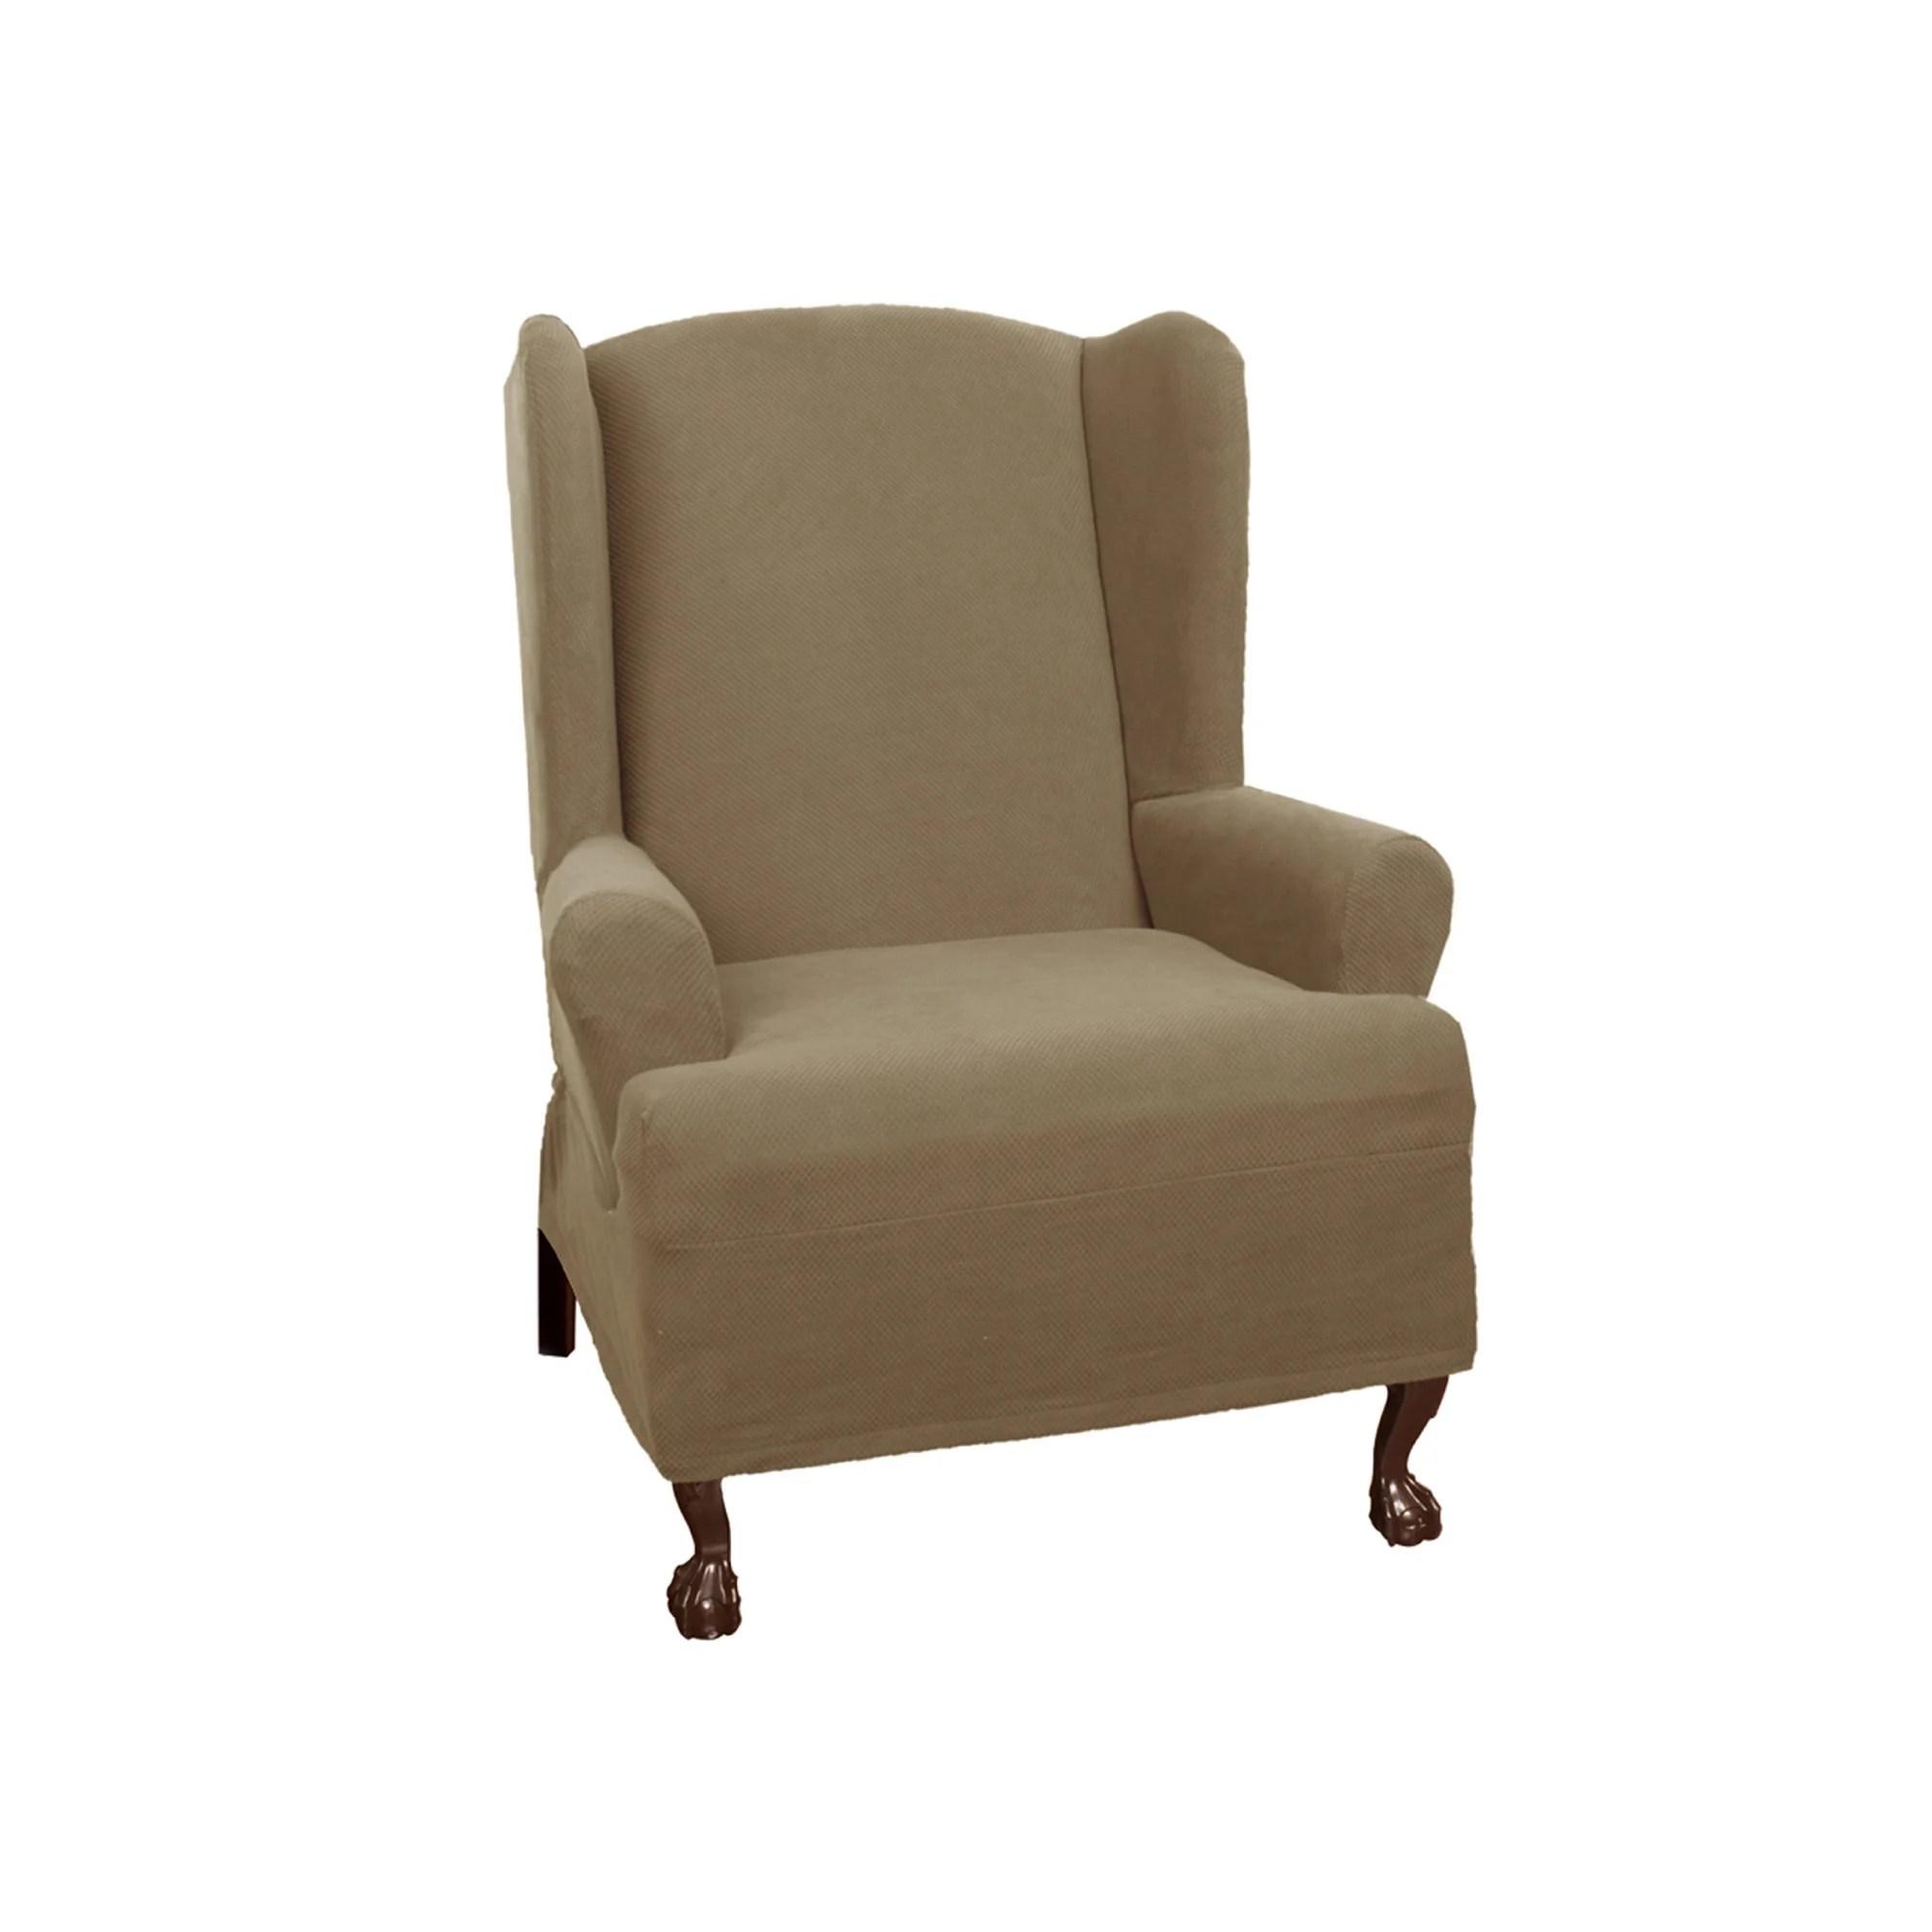 wingback chair covers on ebay baseball bean bag maytex pixel stretch wing t cushion slipcover